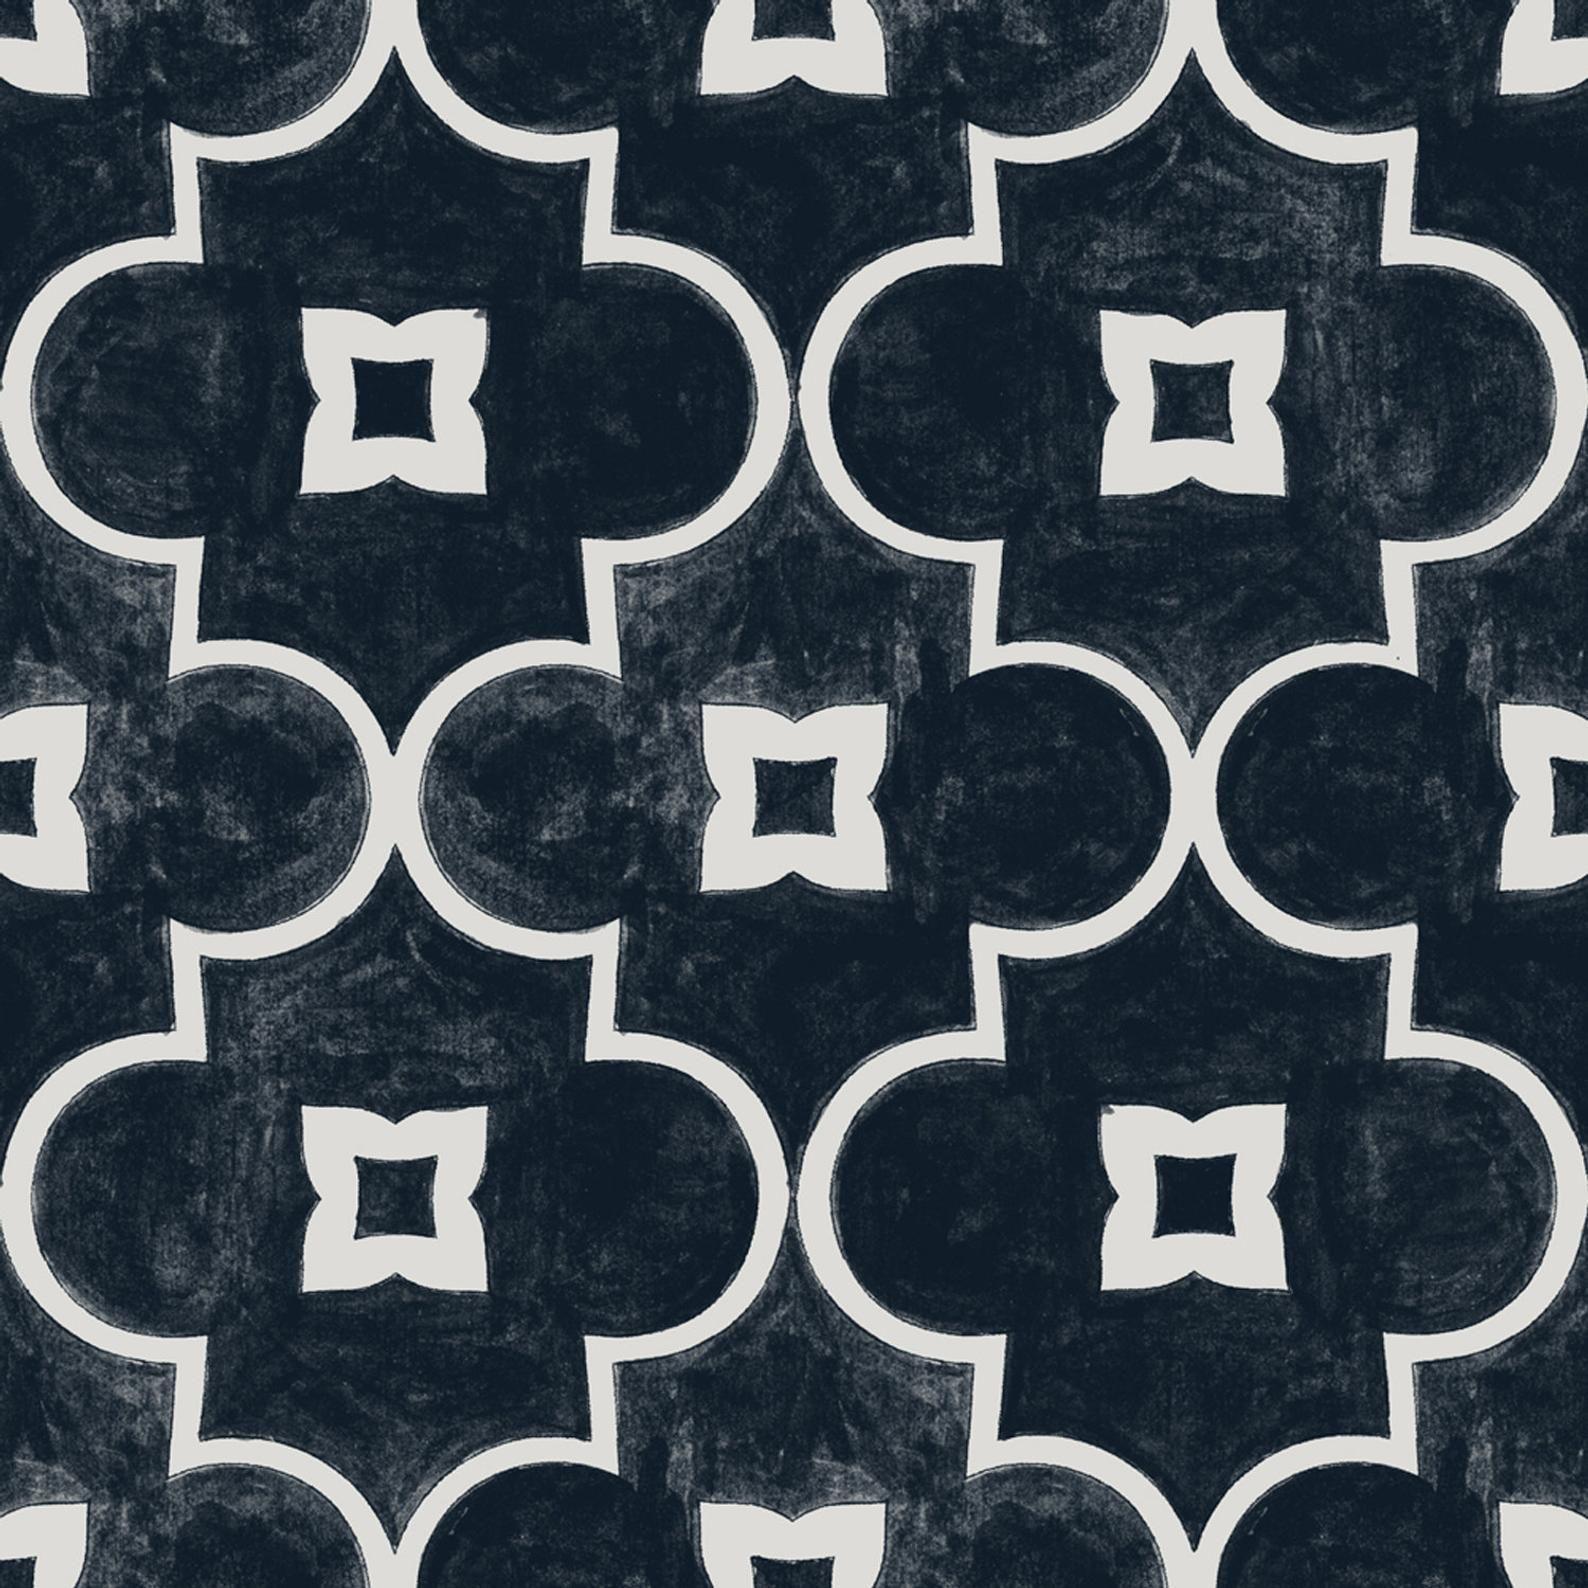 Kitchen and Bathroom Splashback - Removable Vinyl Wallpaper - Arabelle Black - Peel & Stick #bathroomsplashback Kitchen and Bathroom Splashback Removable Vinyl Wallpaper | Etsy #bathroomsplashback